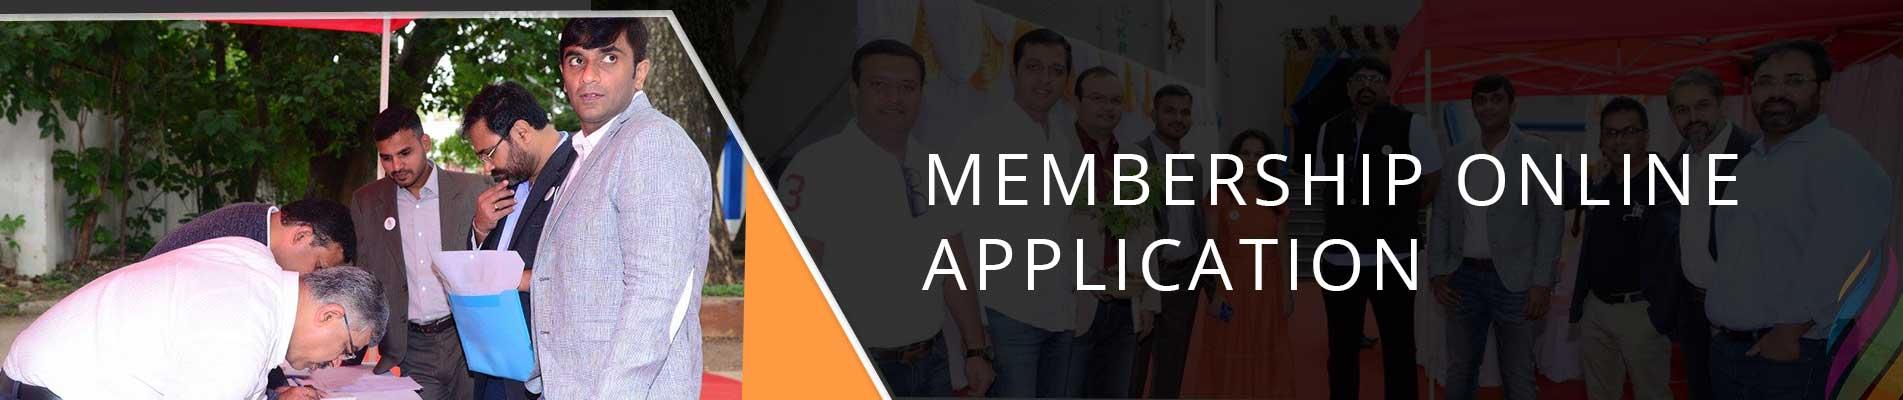 Membership Online Application